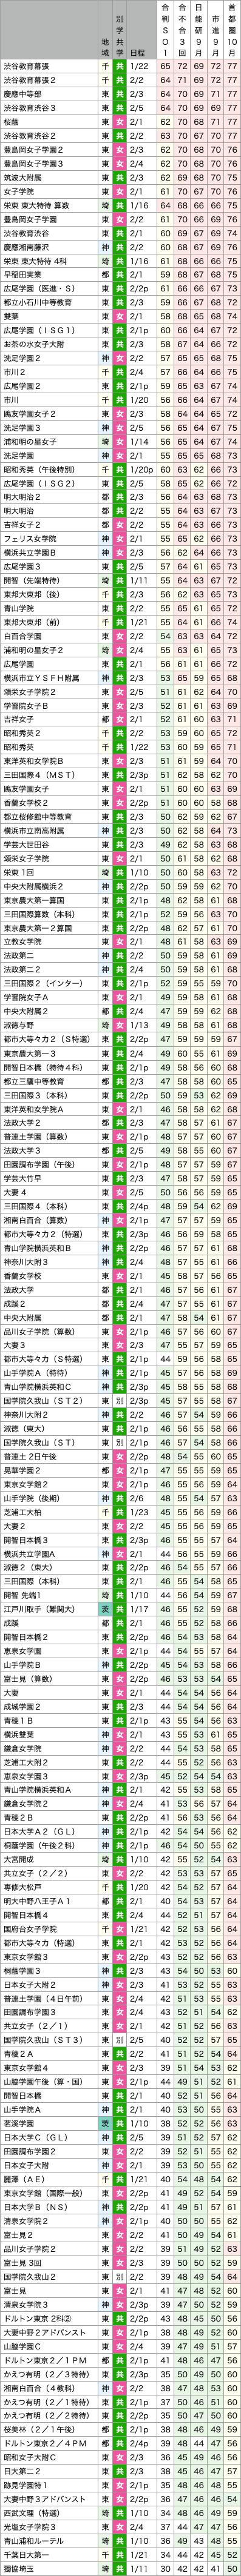 https://e-tutor.tokyo/data/20201009.png